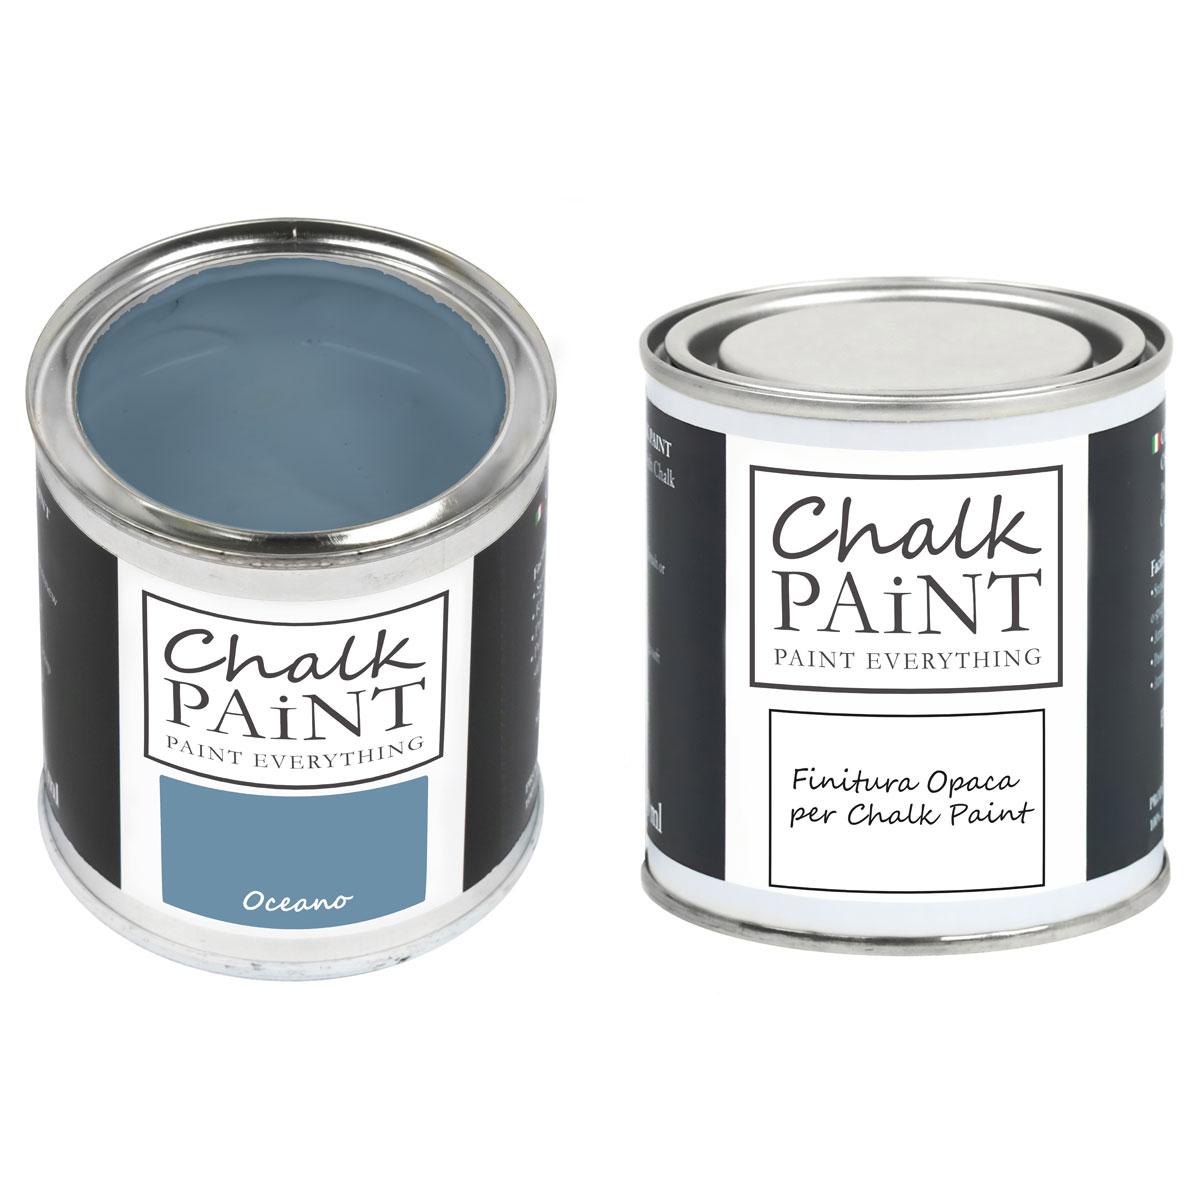 Chalk Paint Oceano paint magic